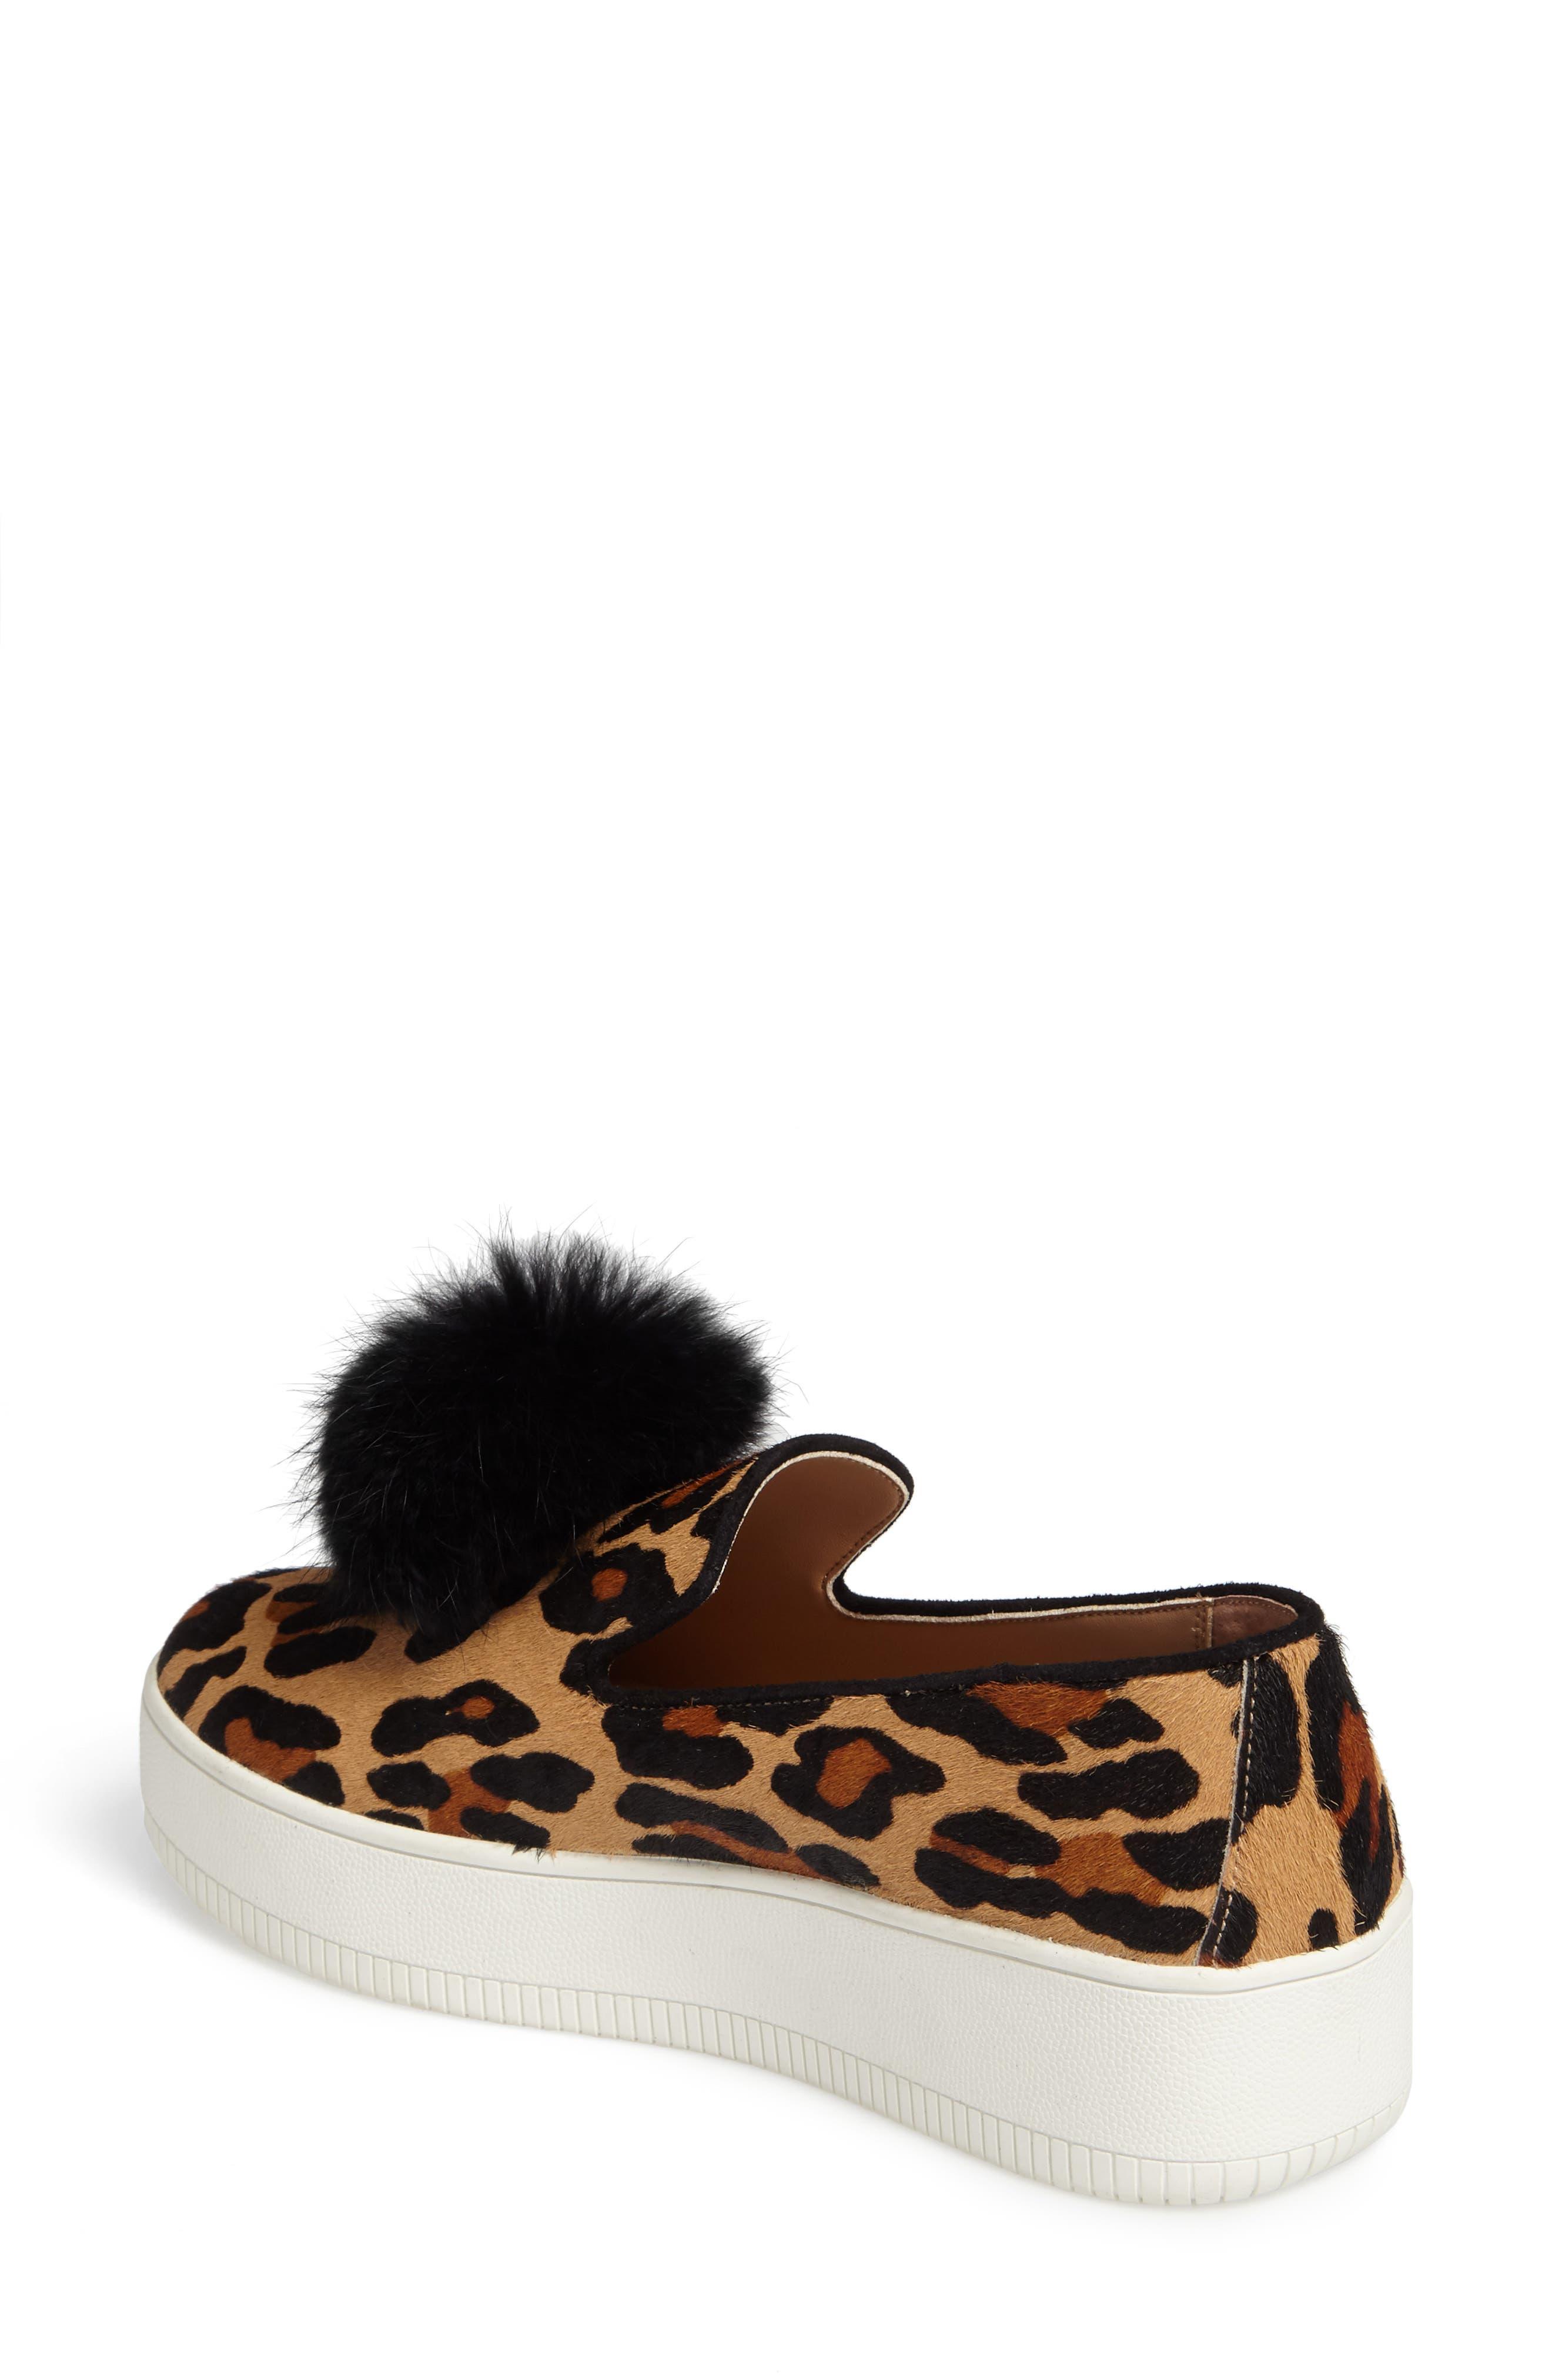 Sammy II Genuine Calf Hair Platform Sneaker with Genuine Rabbit Fur Trim,                             Alternate thumbnail 2, color,                             215